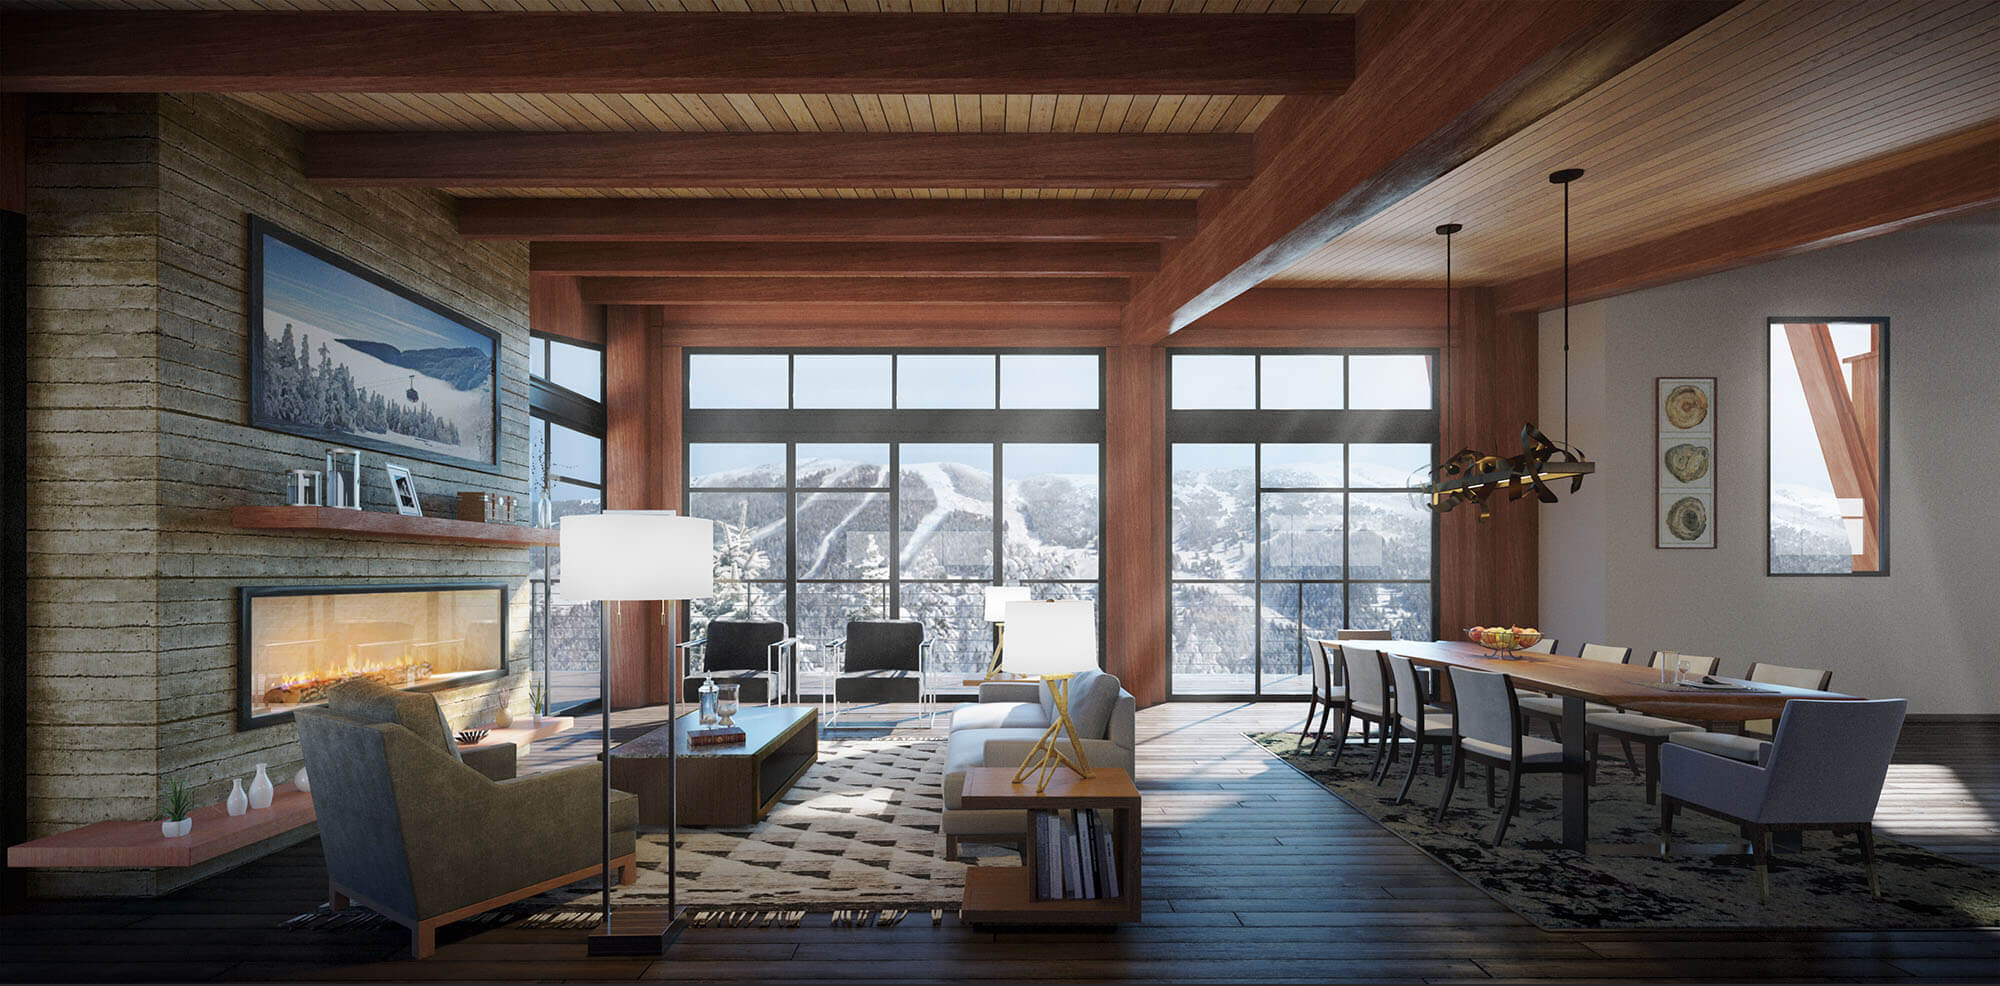 Lot-8-Private-Residence-interior.jpg